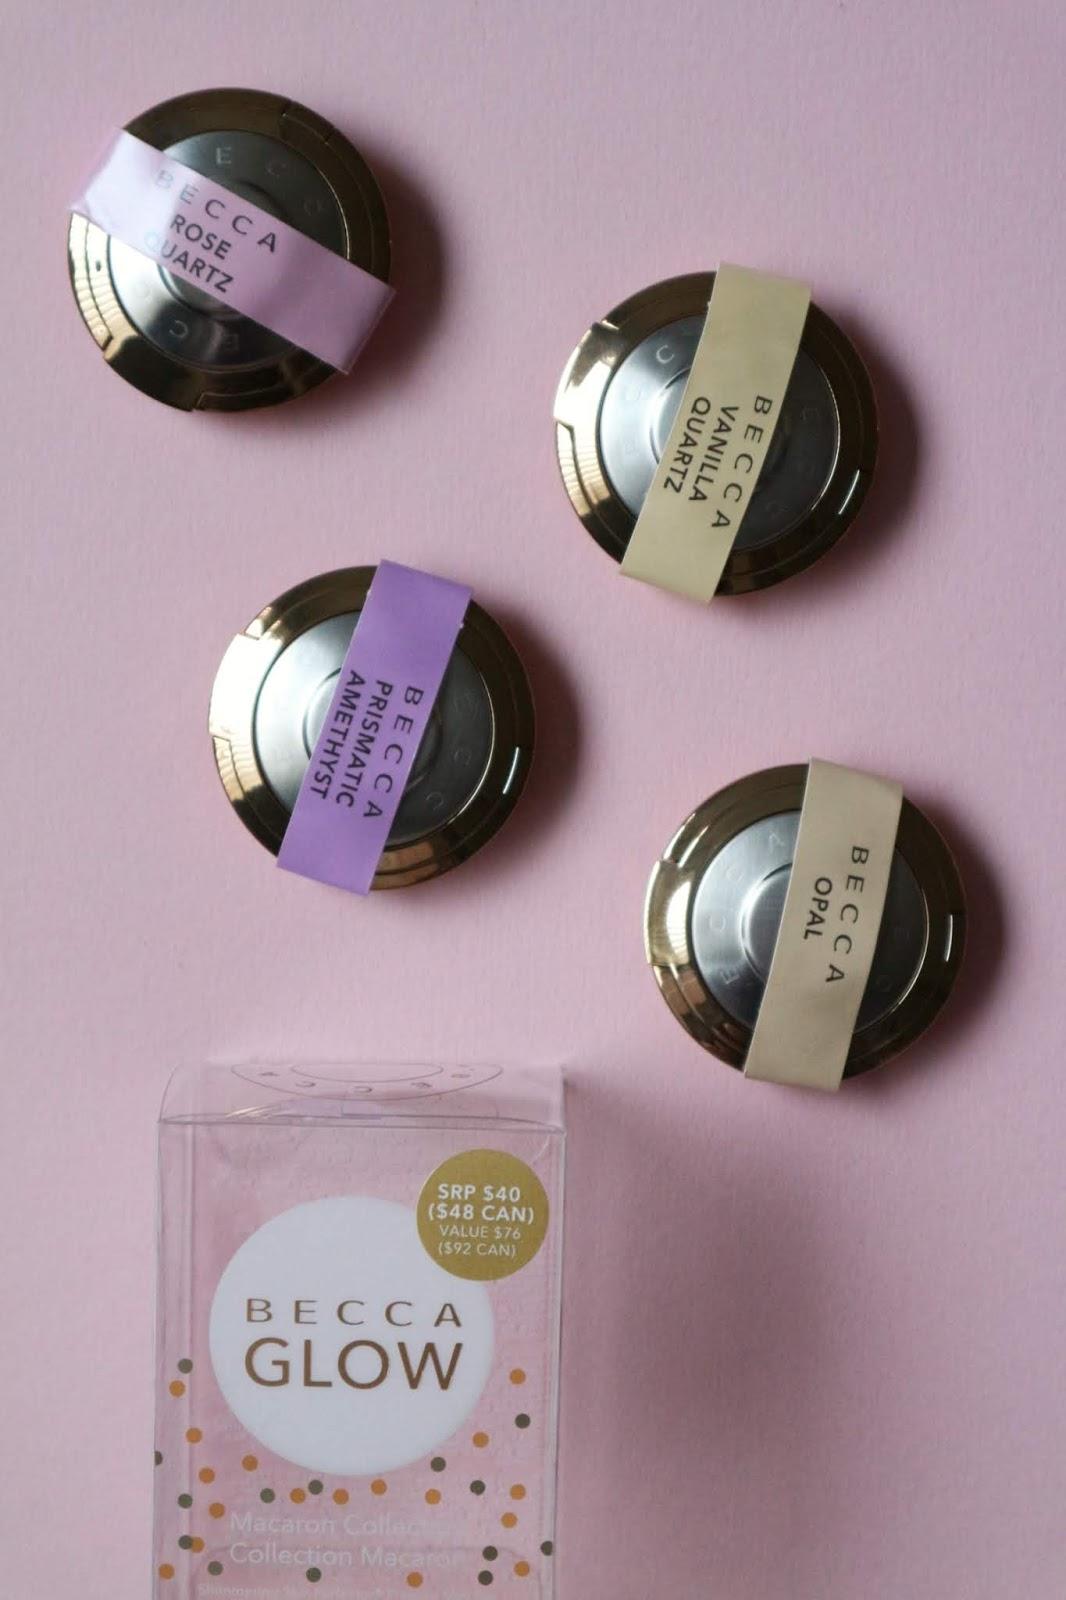 becca macaron set